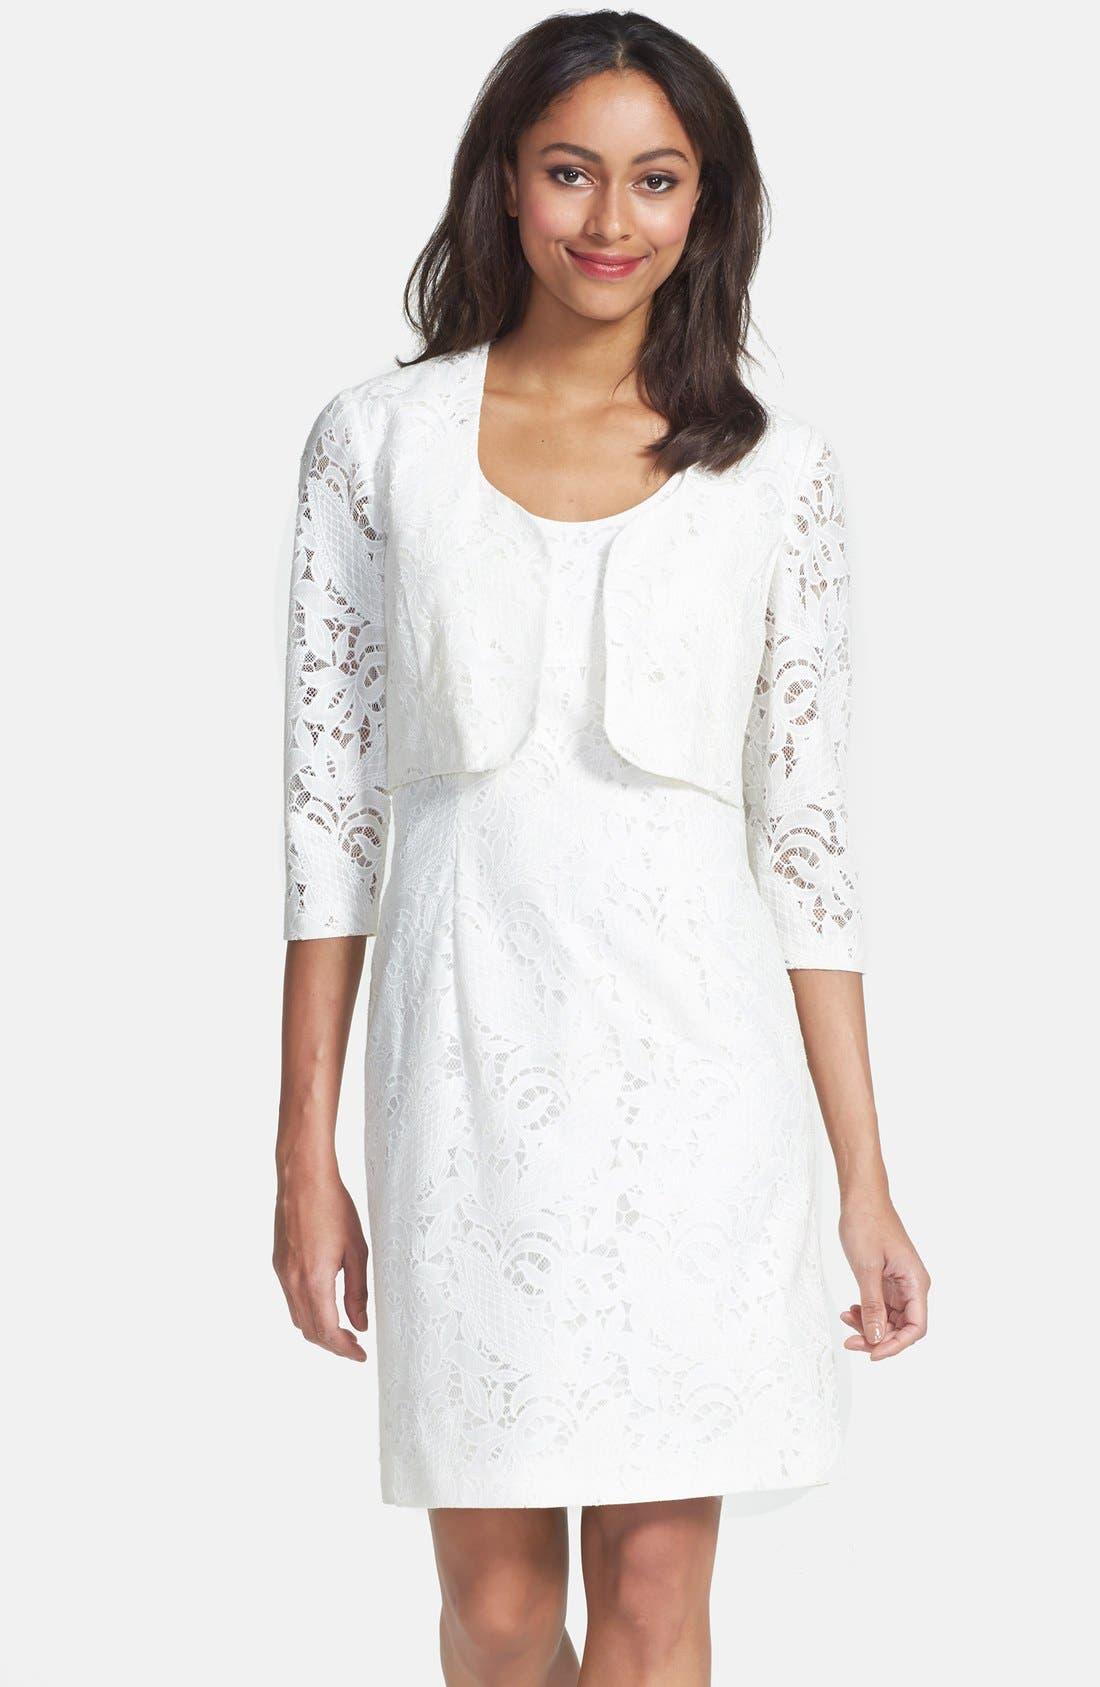 Alternate Image 1 Selected - Tahari Lace Dress & Jacket